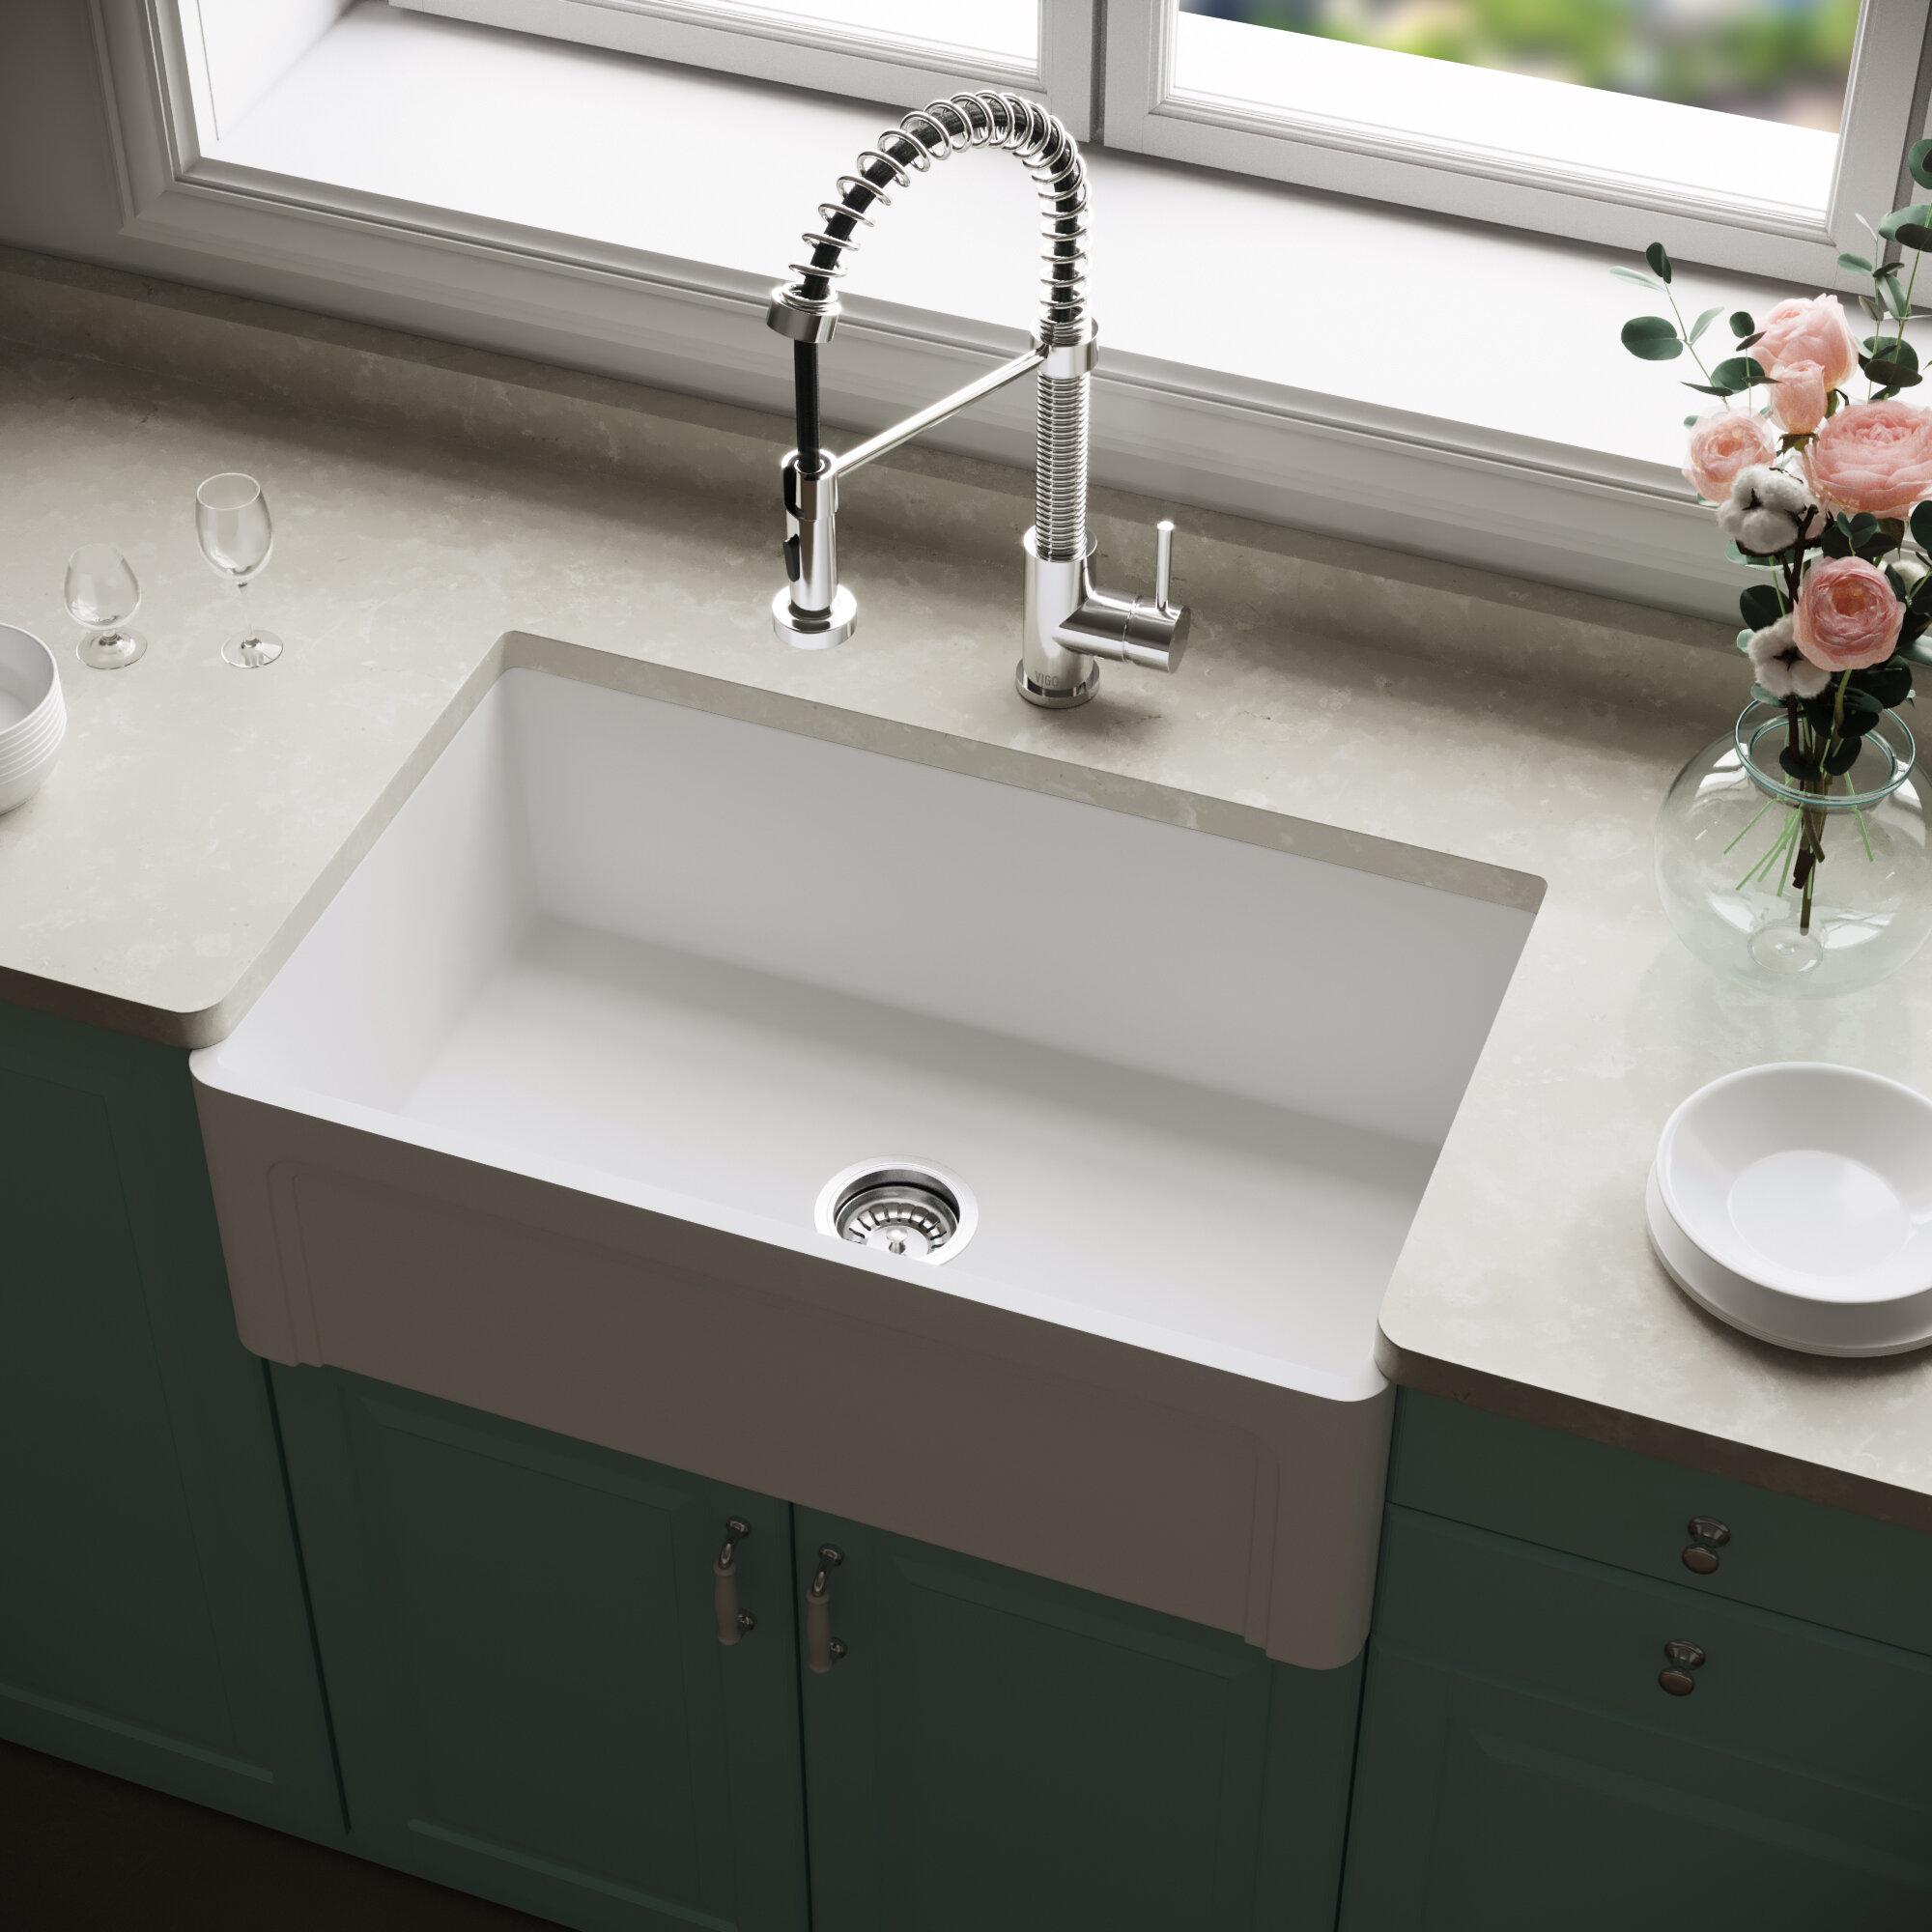 Vigo Matte Stone 30 X 18 Farmhouse Kitchen Sink Reviews Wayfair